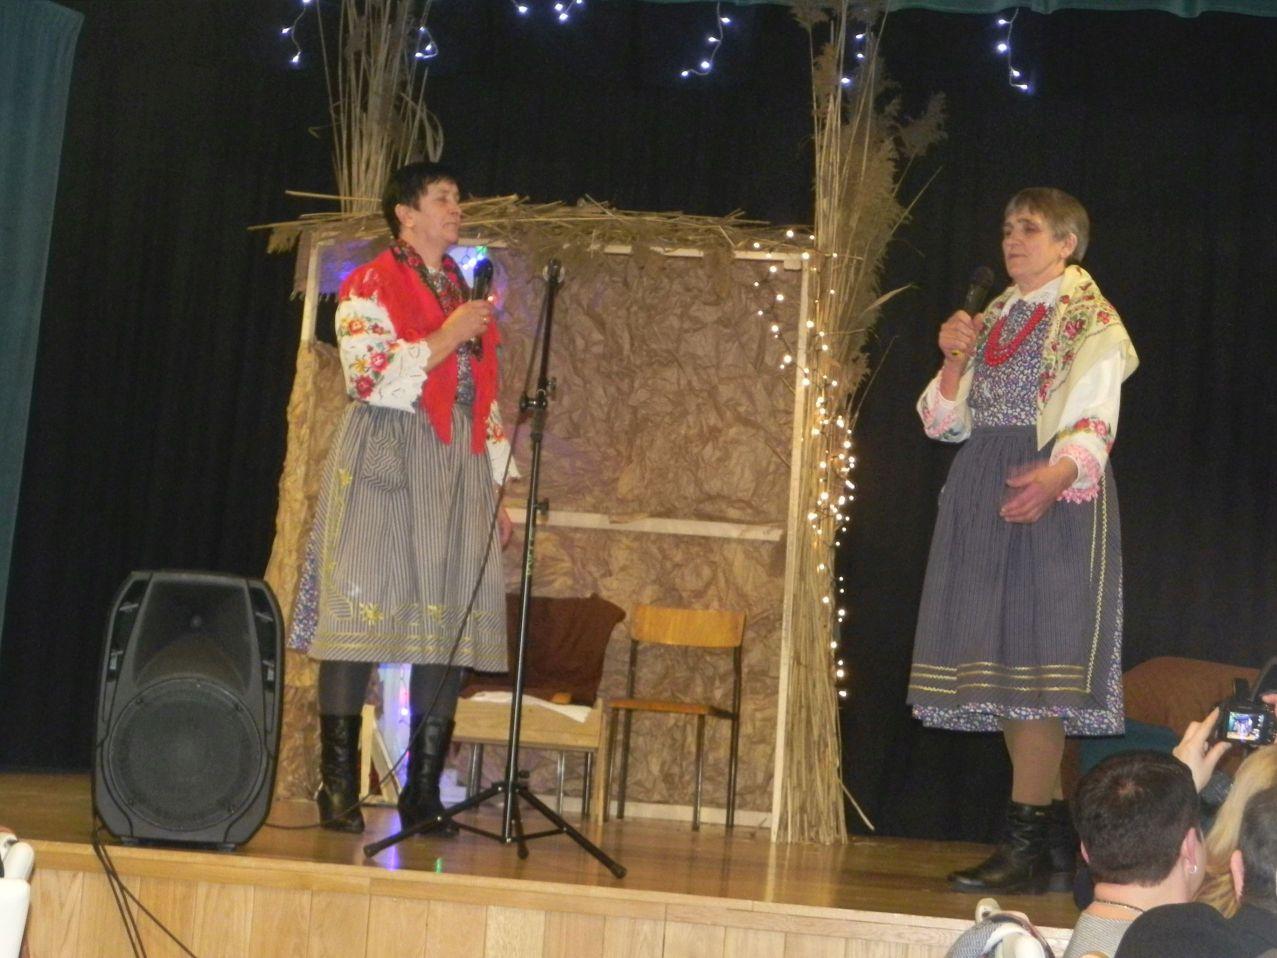 2016-01-23 Boguszyce - gawęda (17)